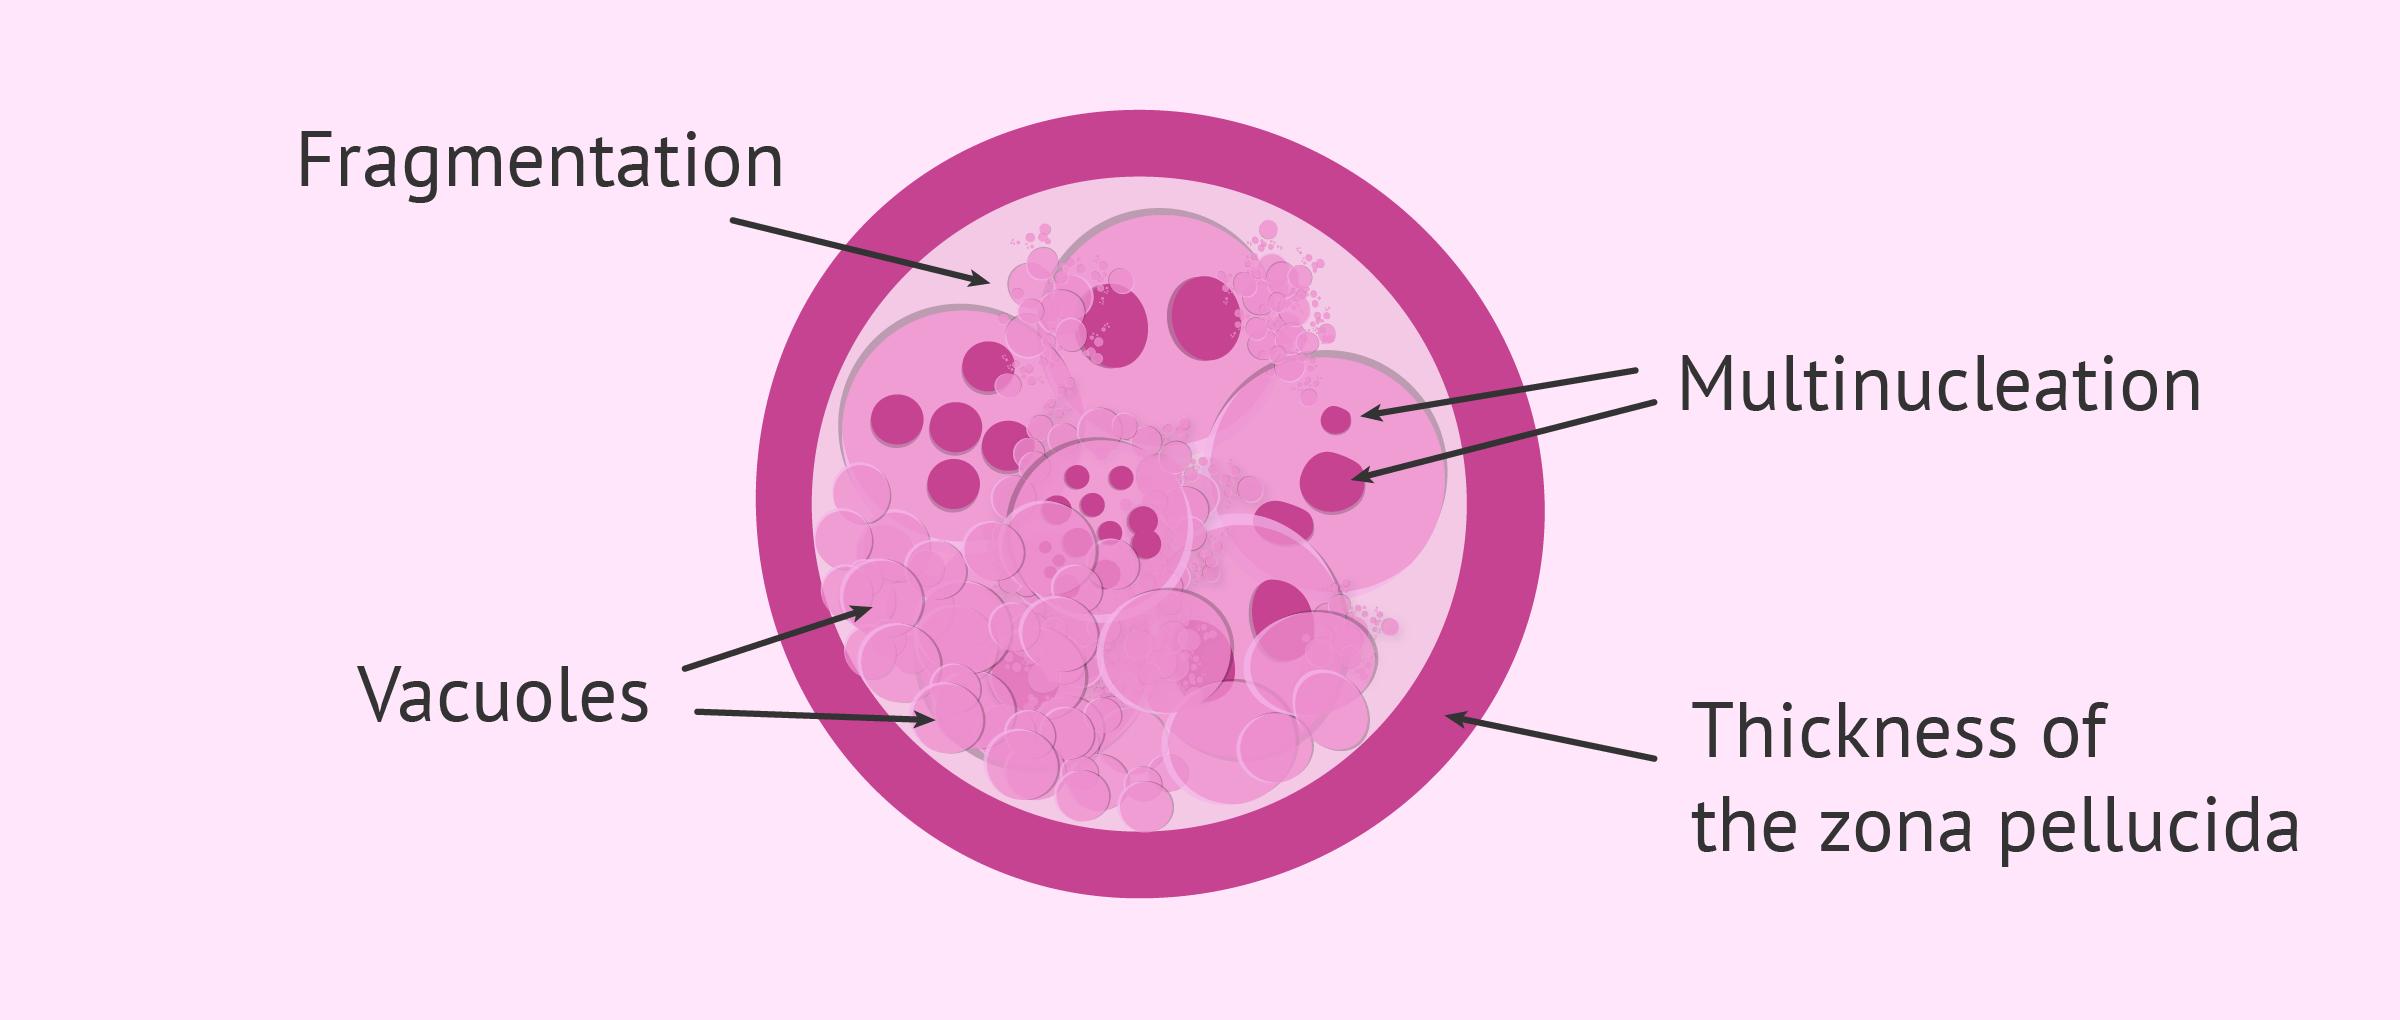 Morphological criteria for embryon grading